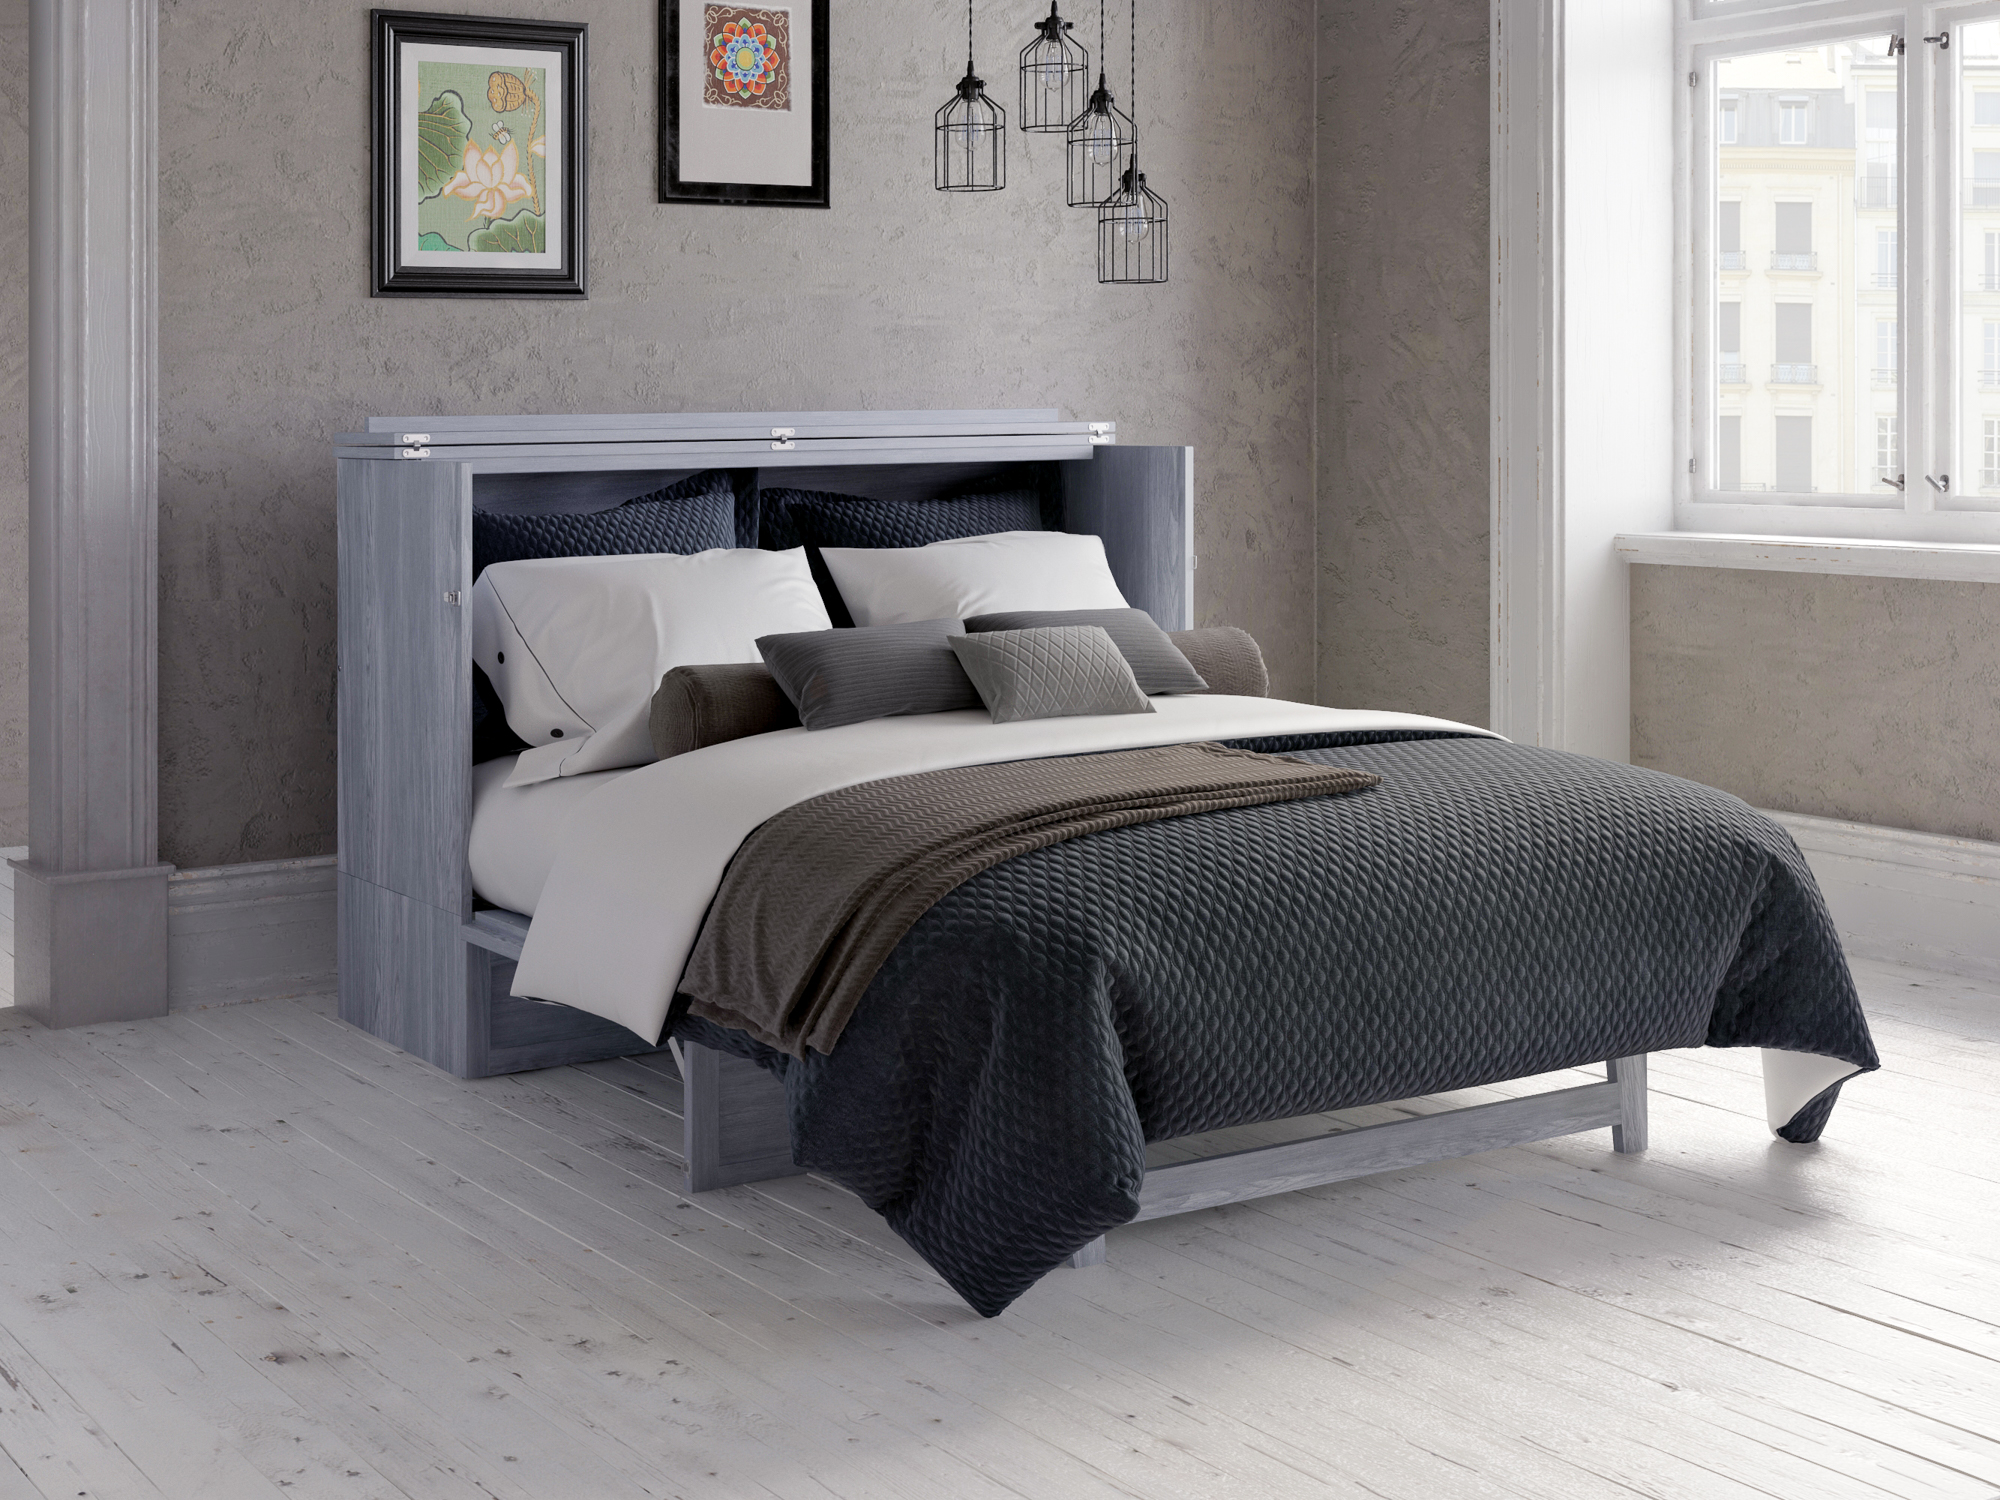 Deerfield Murphy Bed Chest Queen Driftwood With Charging